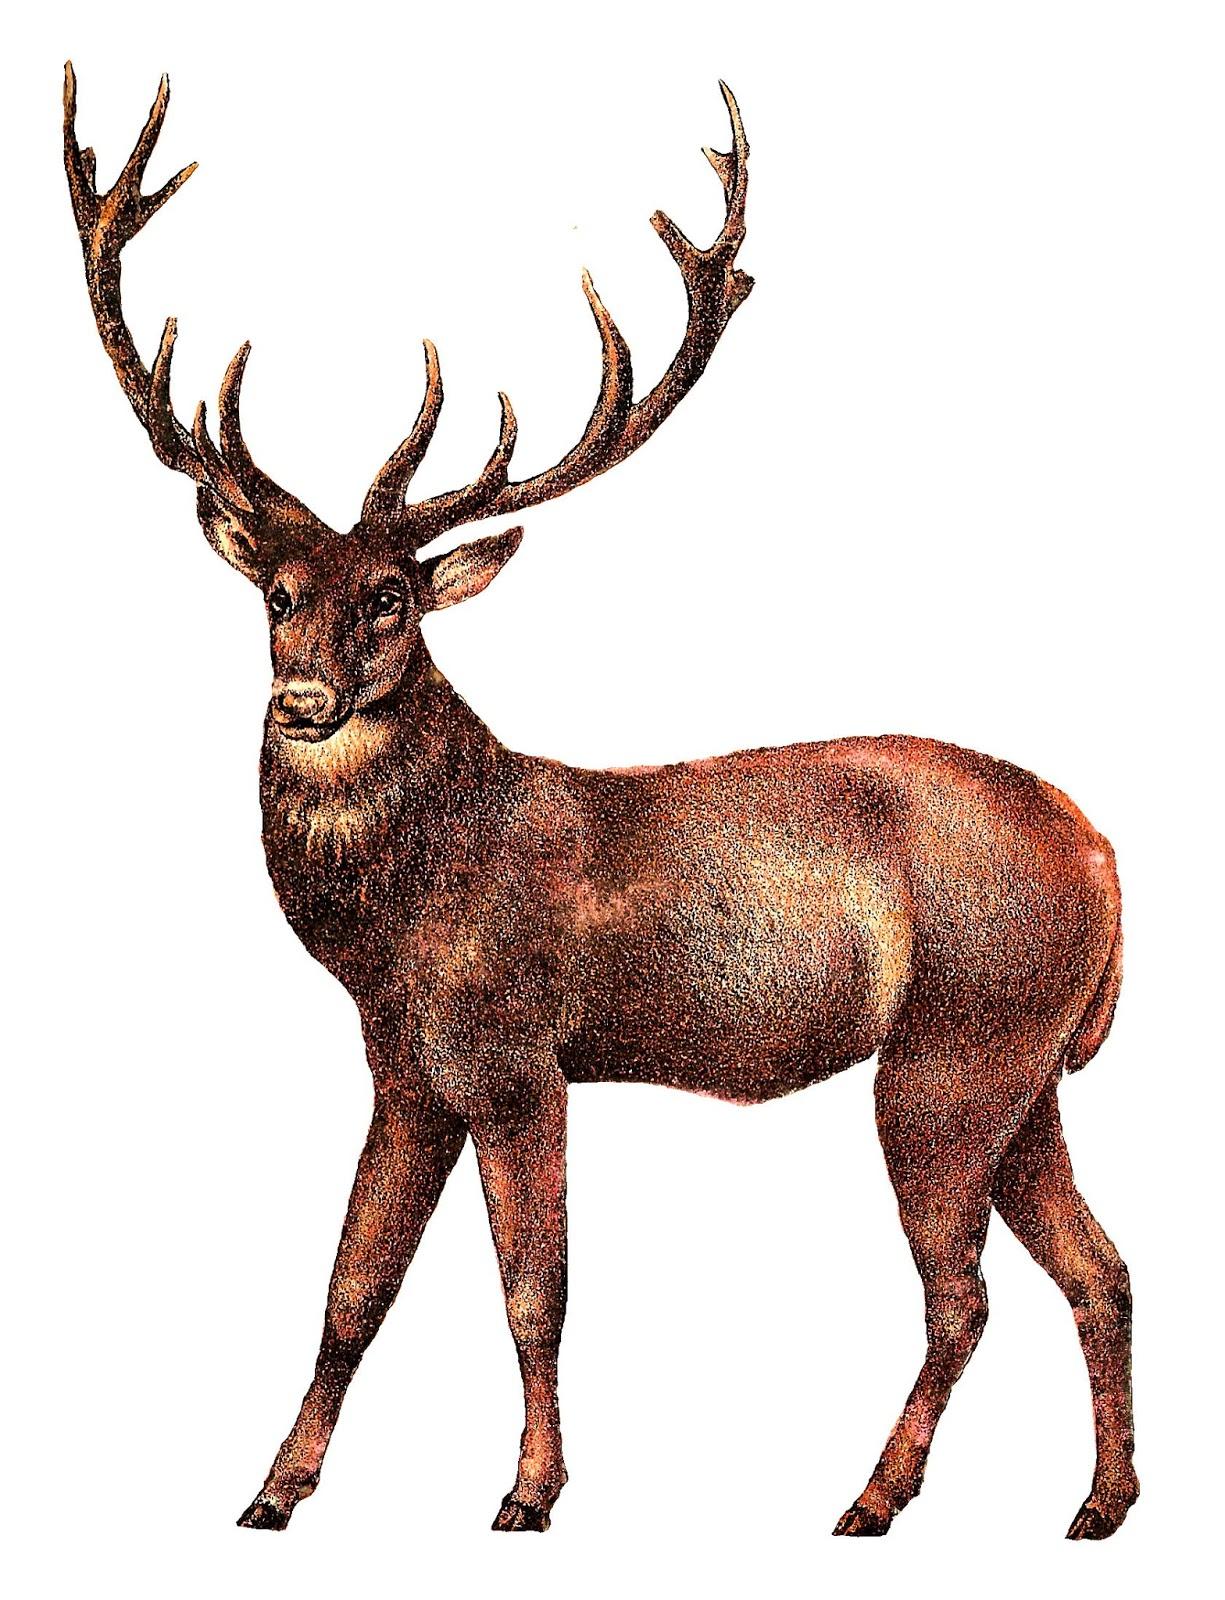 1225x1600 Antique Images Antique Illustrations Animal Digital Clip Art Deer